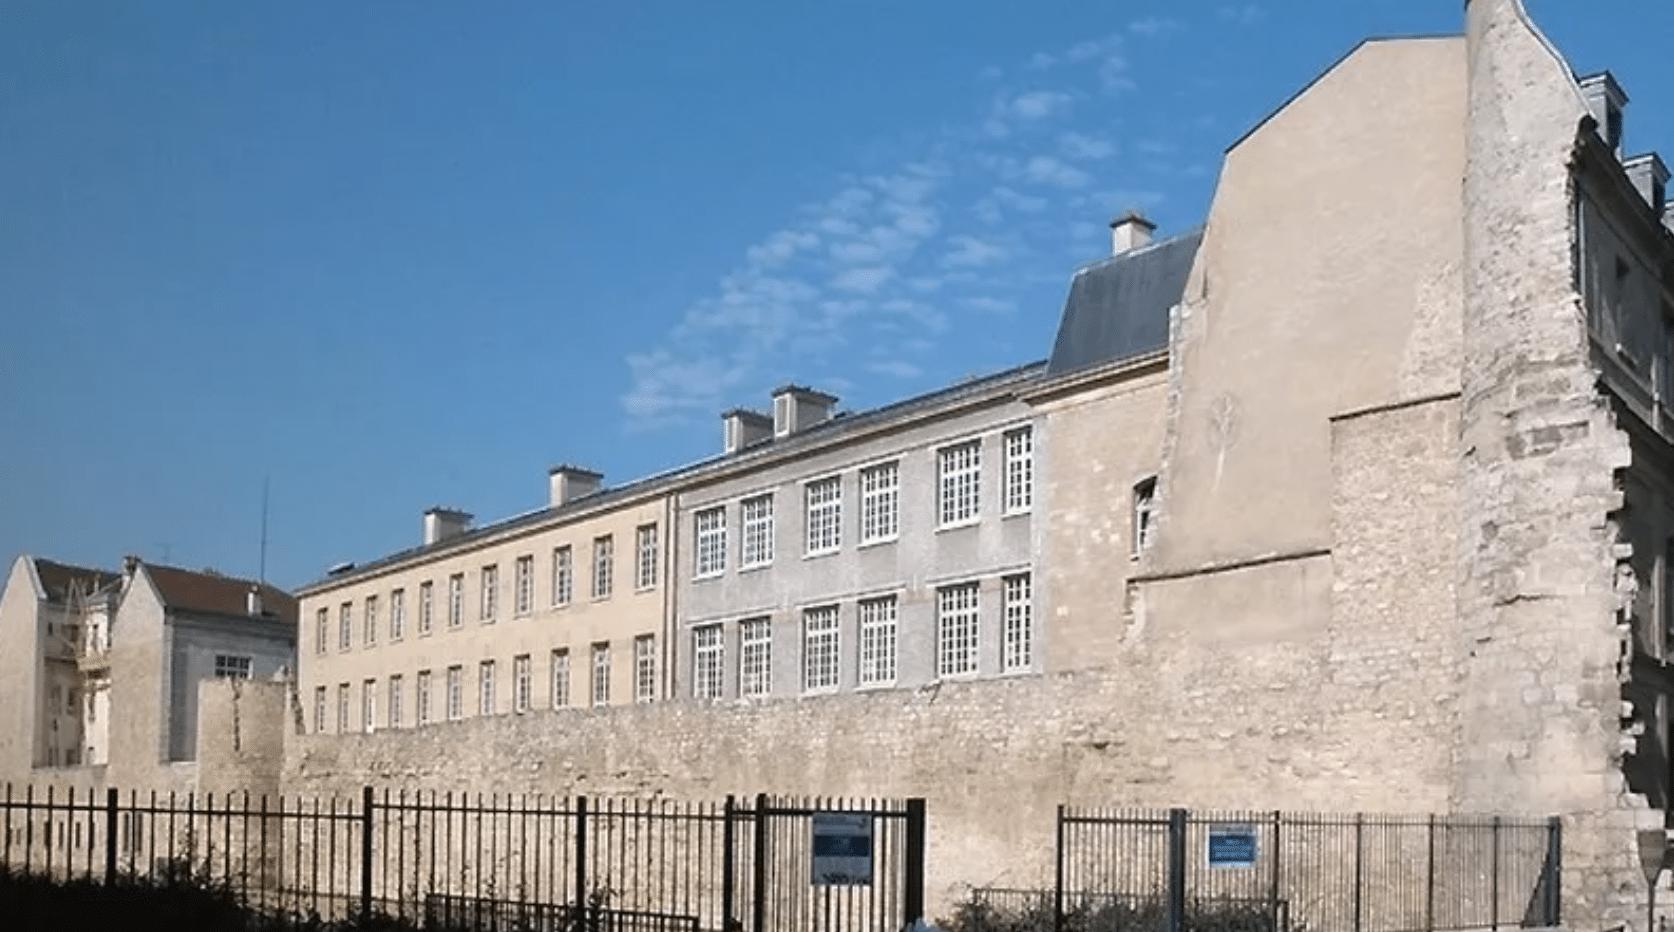 enceinte philippe auguste paris vestige jardins saint paul histoire